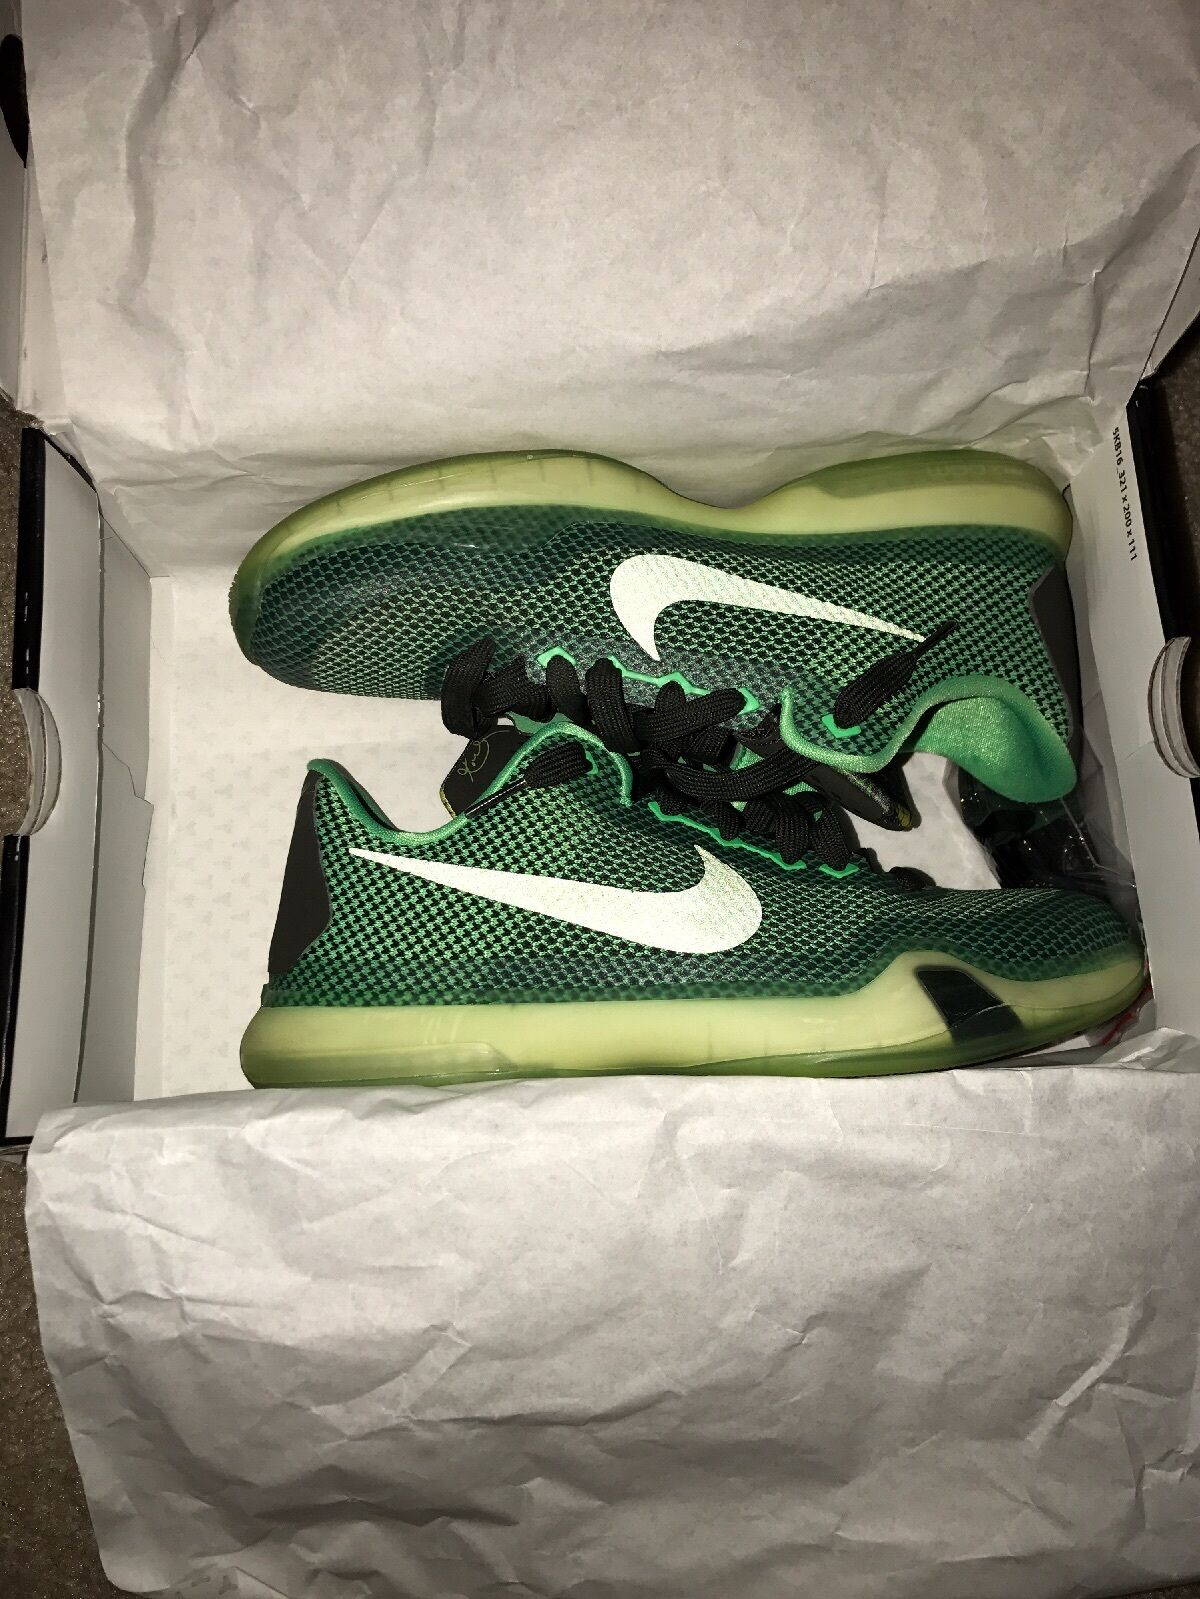 Kobe Green 10 Poison Green Kobe 33702e